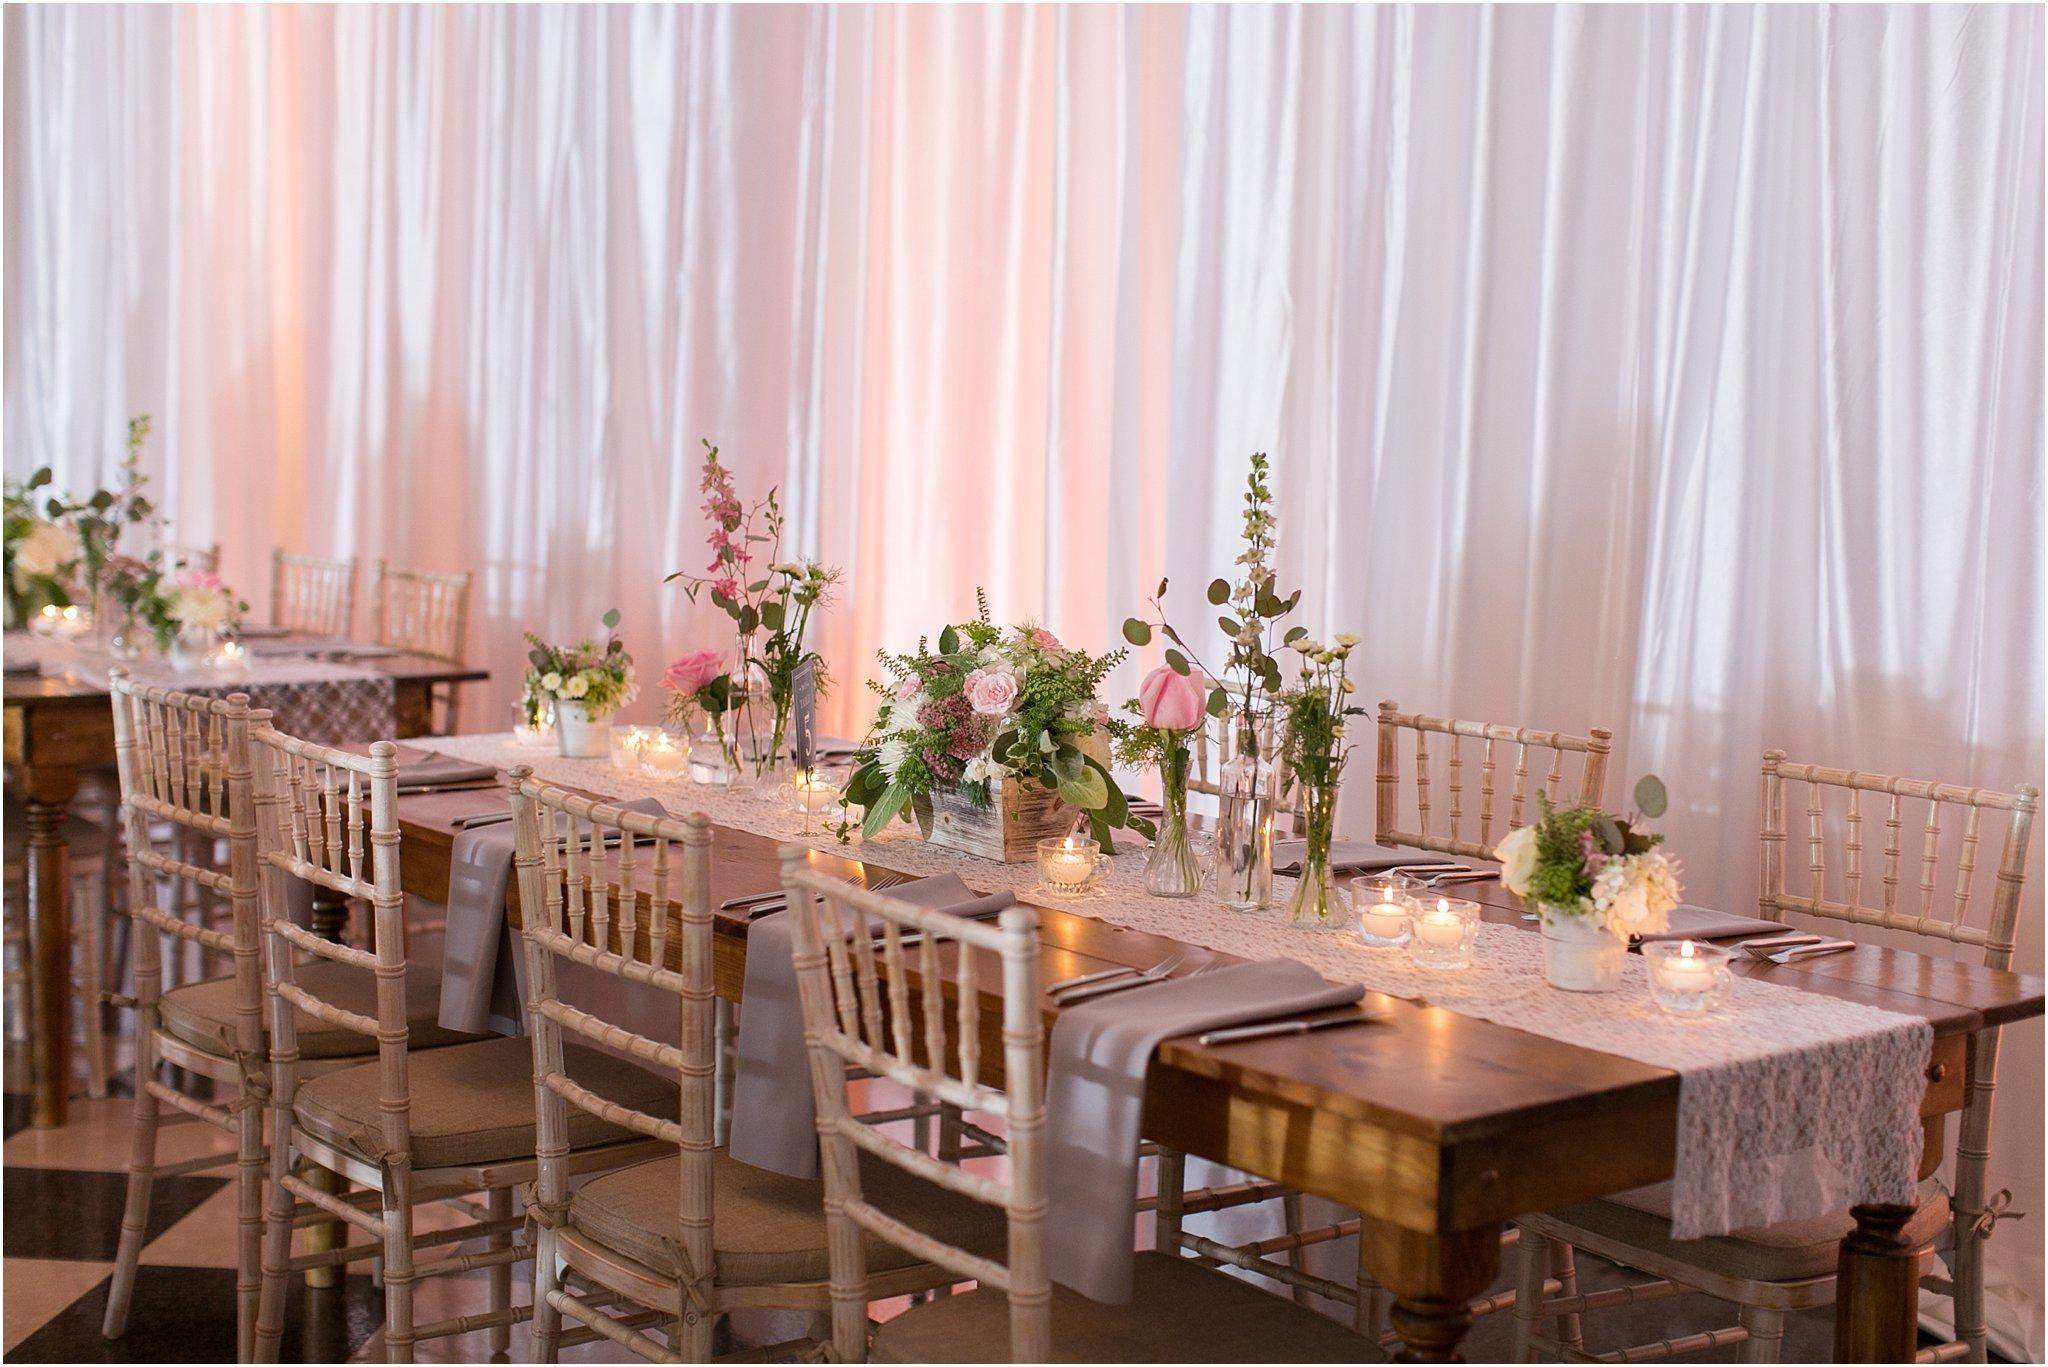 jessica_ryan_photography_virginia_wedding_photographer_wedding_hurricane_norfolk_botanical_gardens_hurricane_matthew_wedding_3614